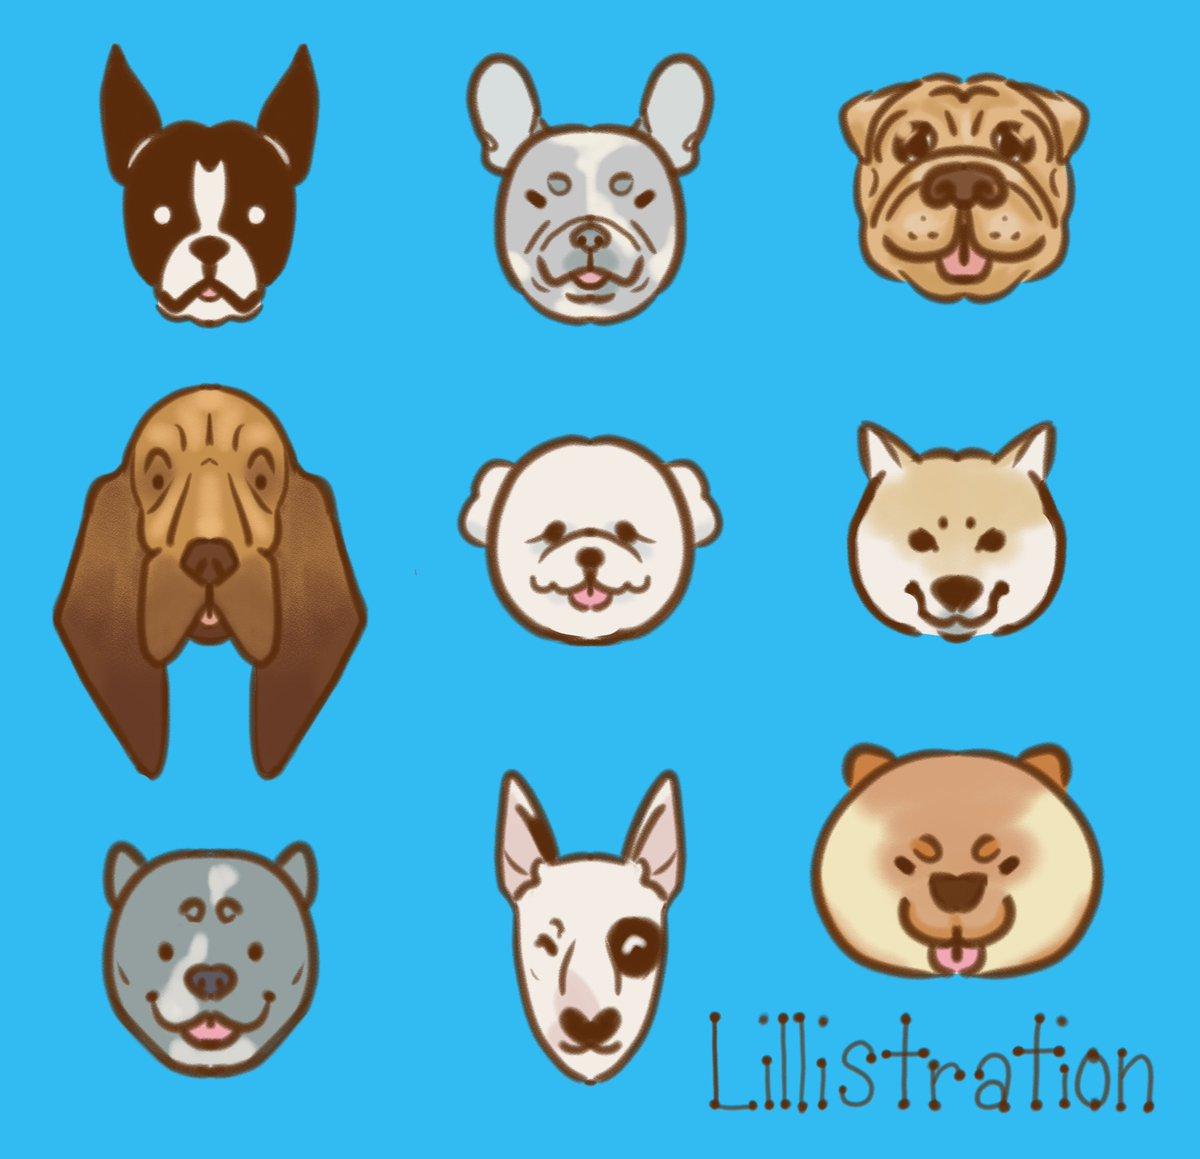 Some symmetrical dogs to match my symmetrical cats!! #dogs #dogsofinstagram #frenchbulldog #bullterrier #pitbull #chow #shibainu #bloodhound #bichonfrise #sharpei #bostonterrier #digitalart<br>http://pic.twitter.com/6dC23VOHHm